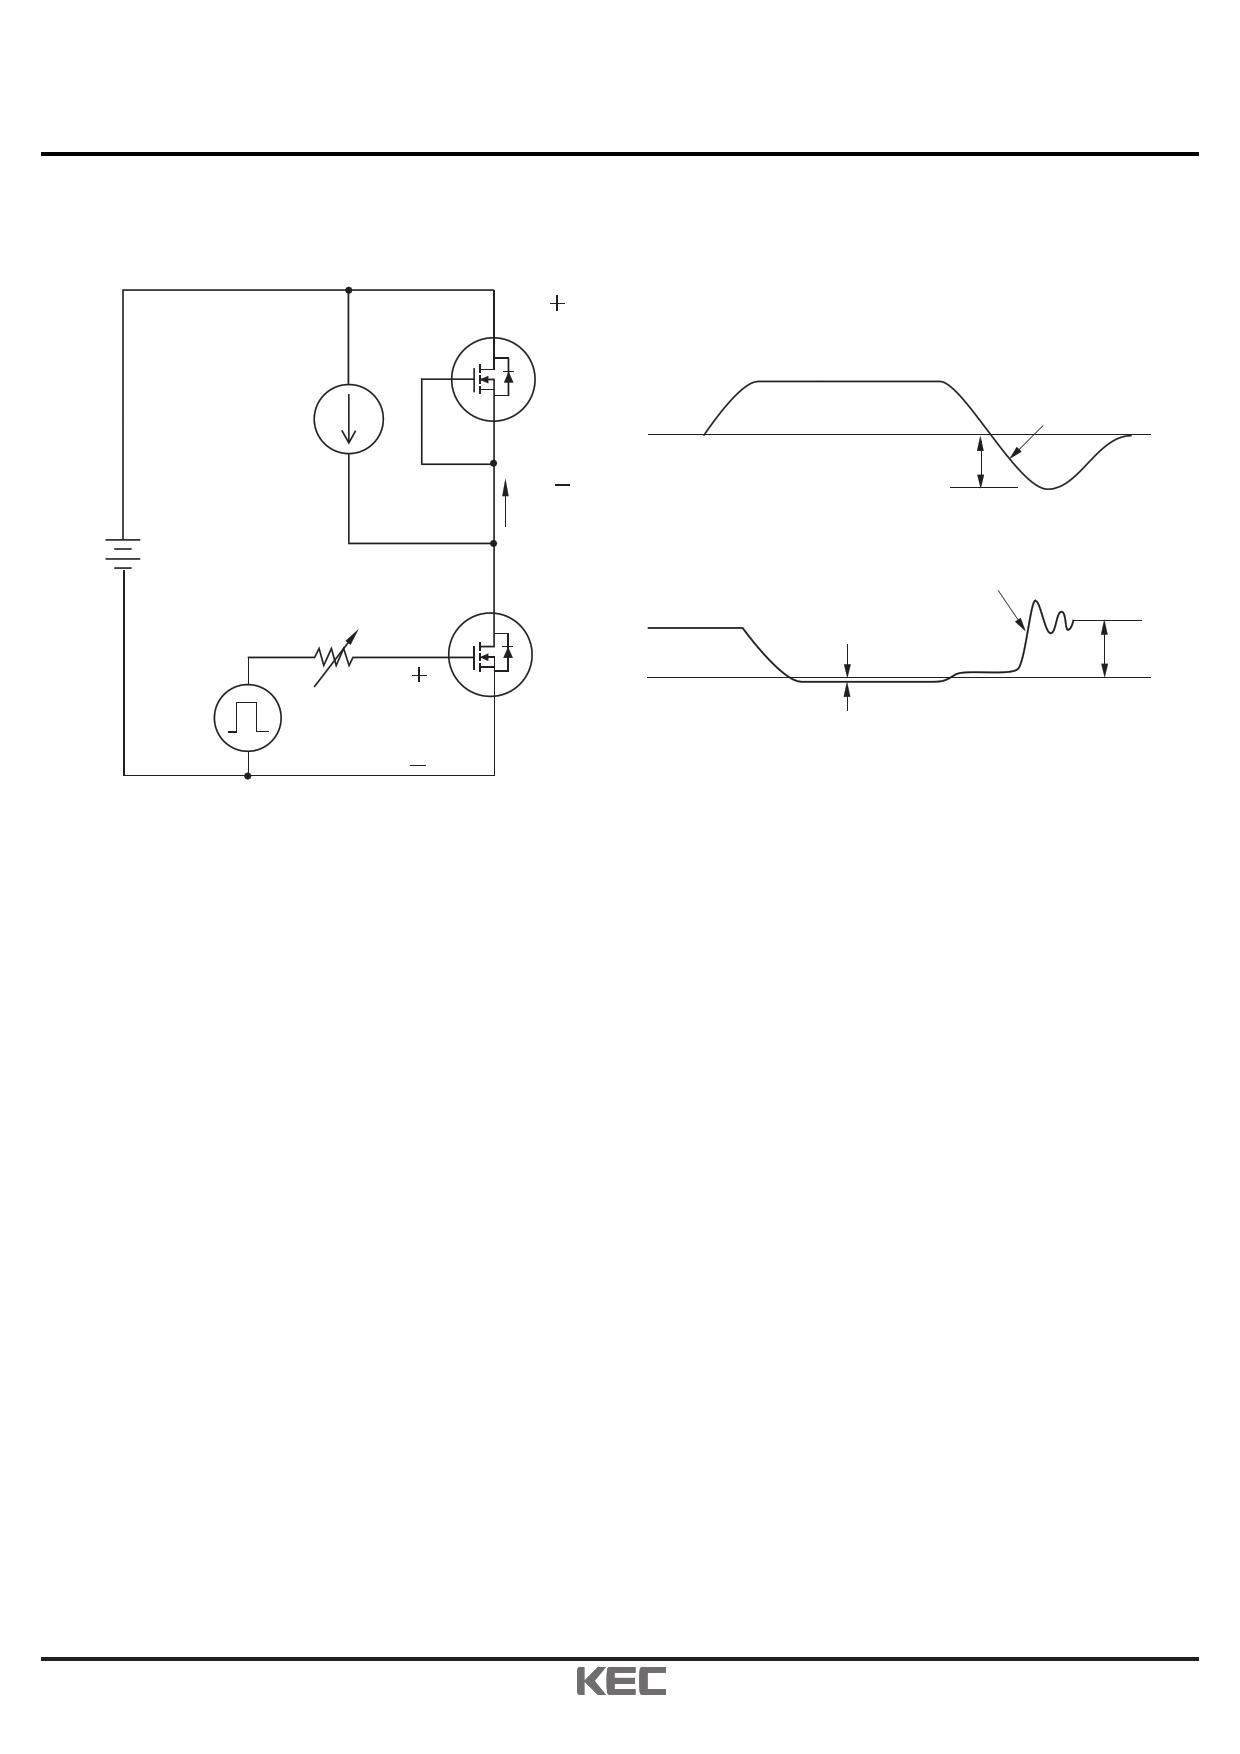 011N40P1 전자부품, 판매, 대치품